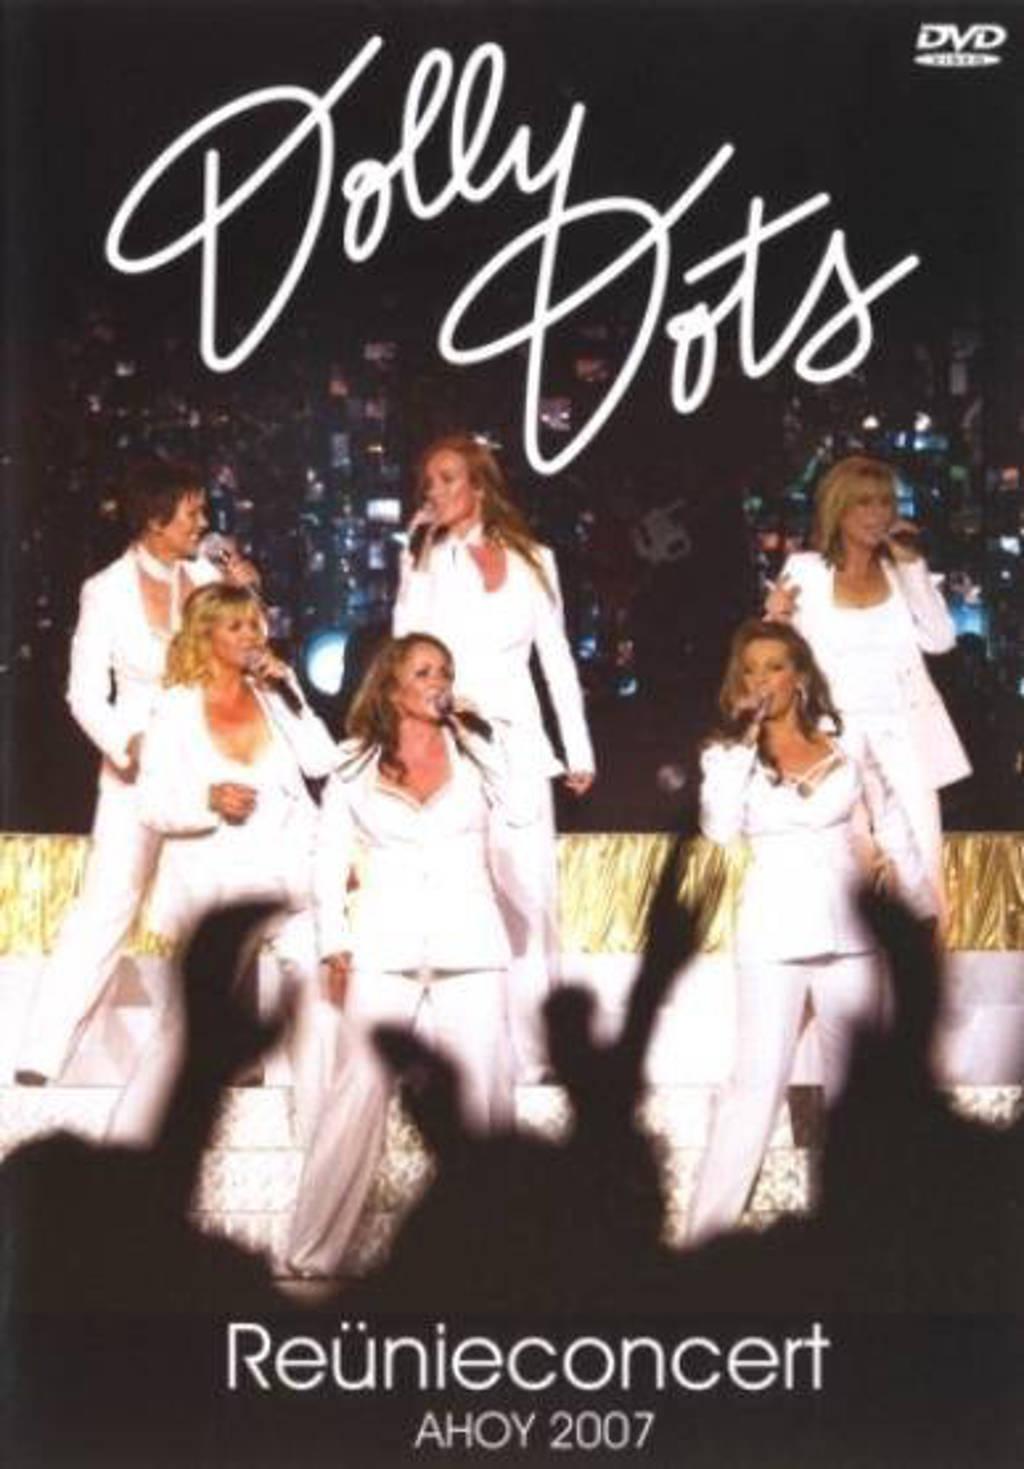 Dolly Dots - Reunie concert 2007 (DVD)